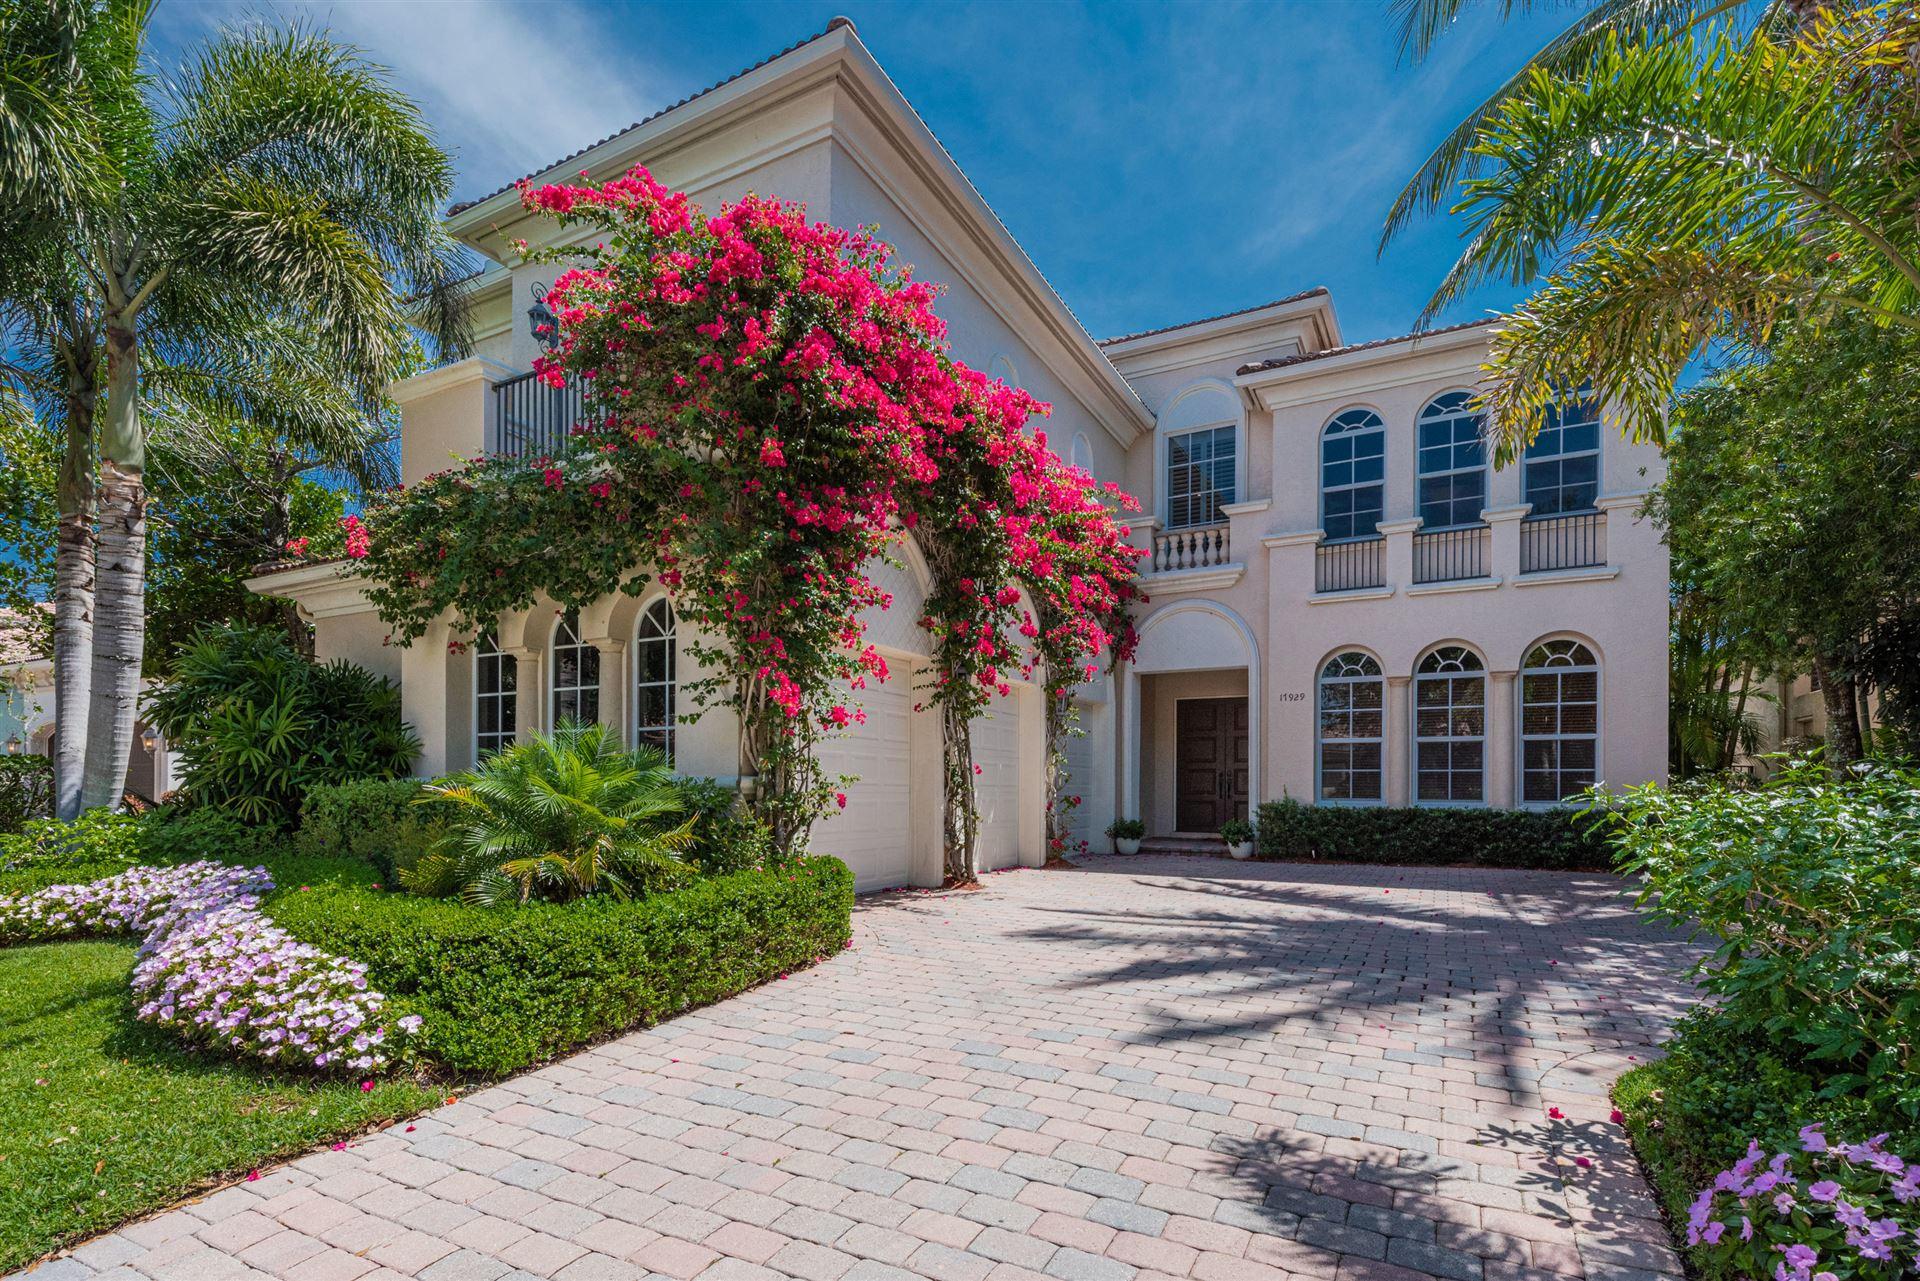 Photo of 17929 Villa Club Way, Boca Raton, FL 33496 (MLS # RX-10708789)